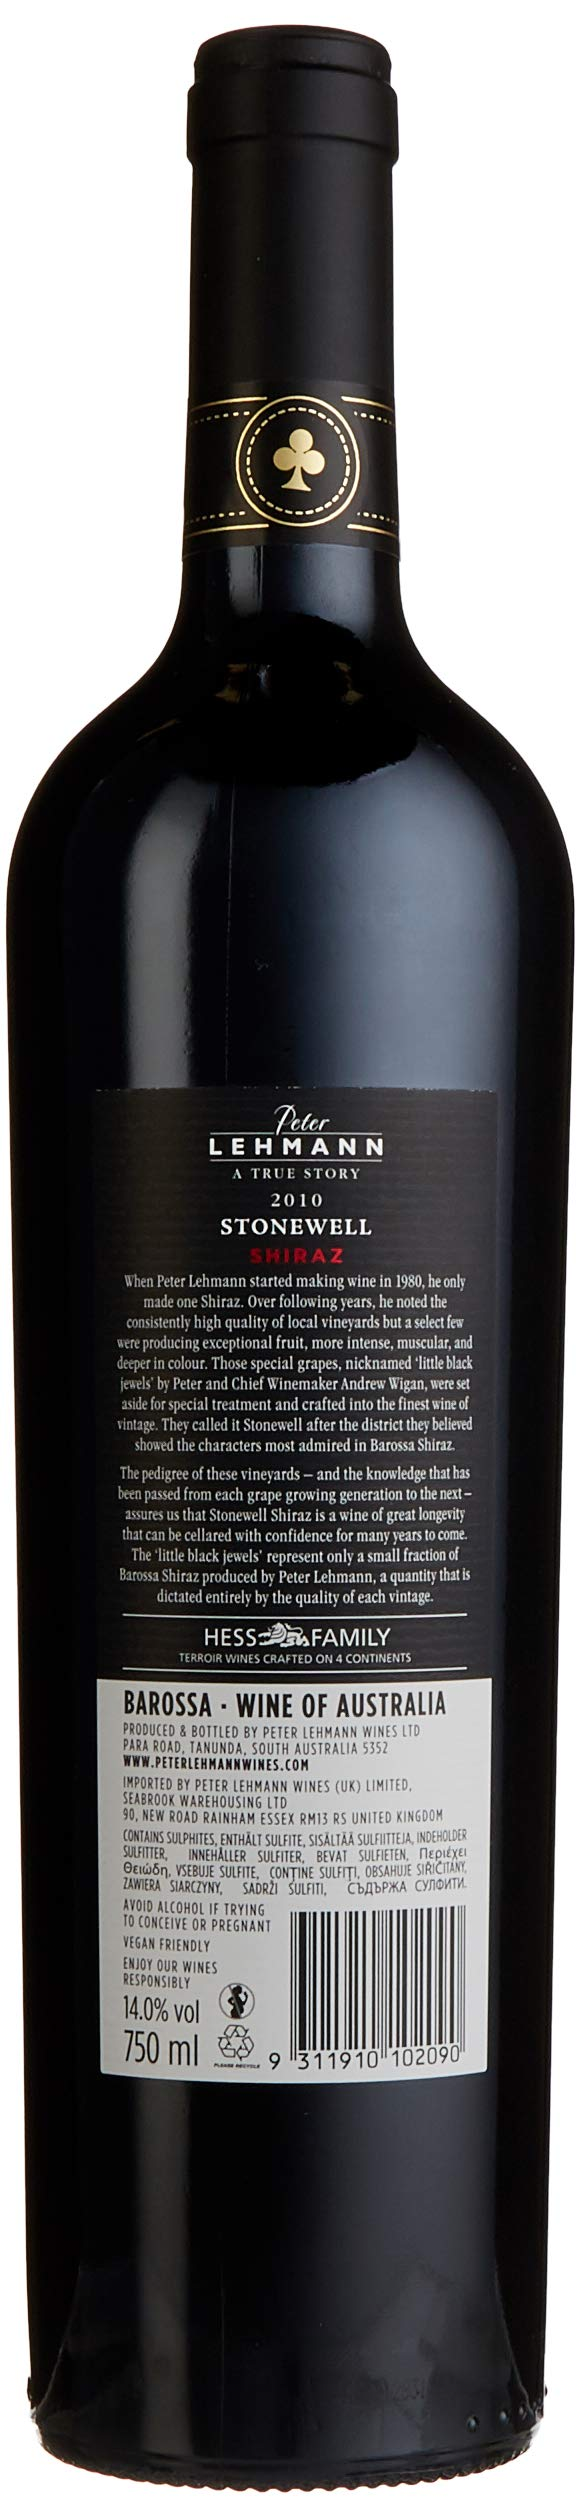 Peter-Lehmann-Stonewell-Shiraz-2010-trocken-1-x-075-l